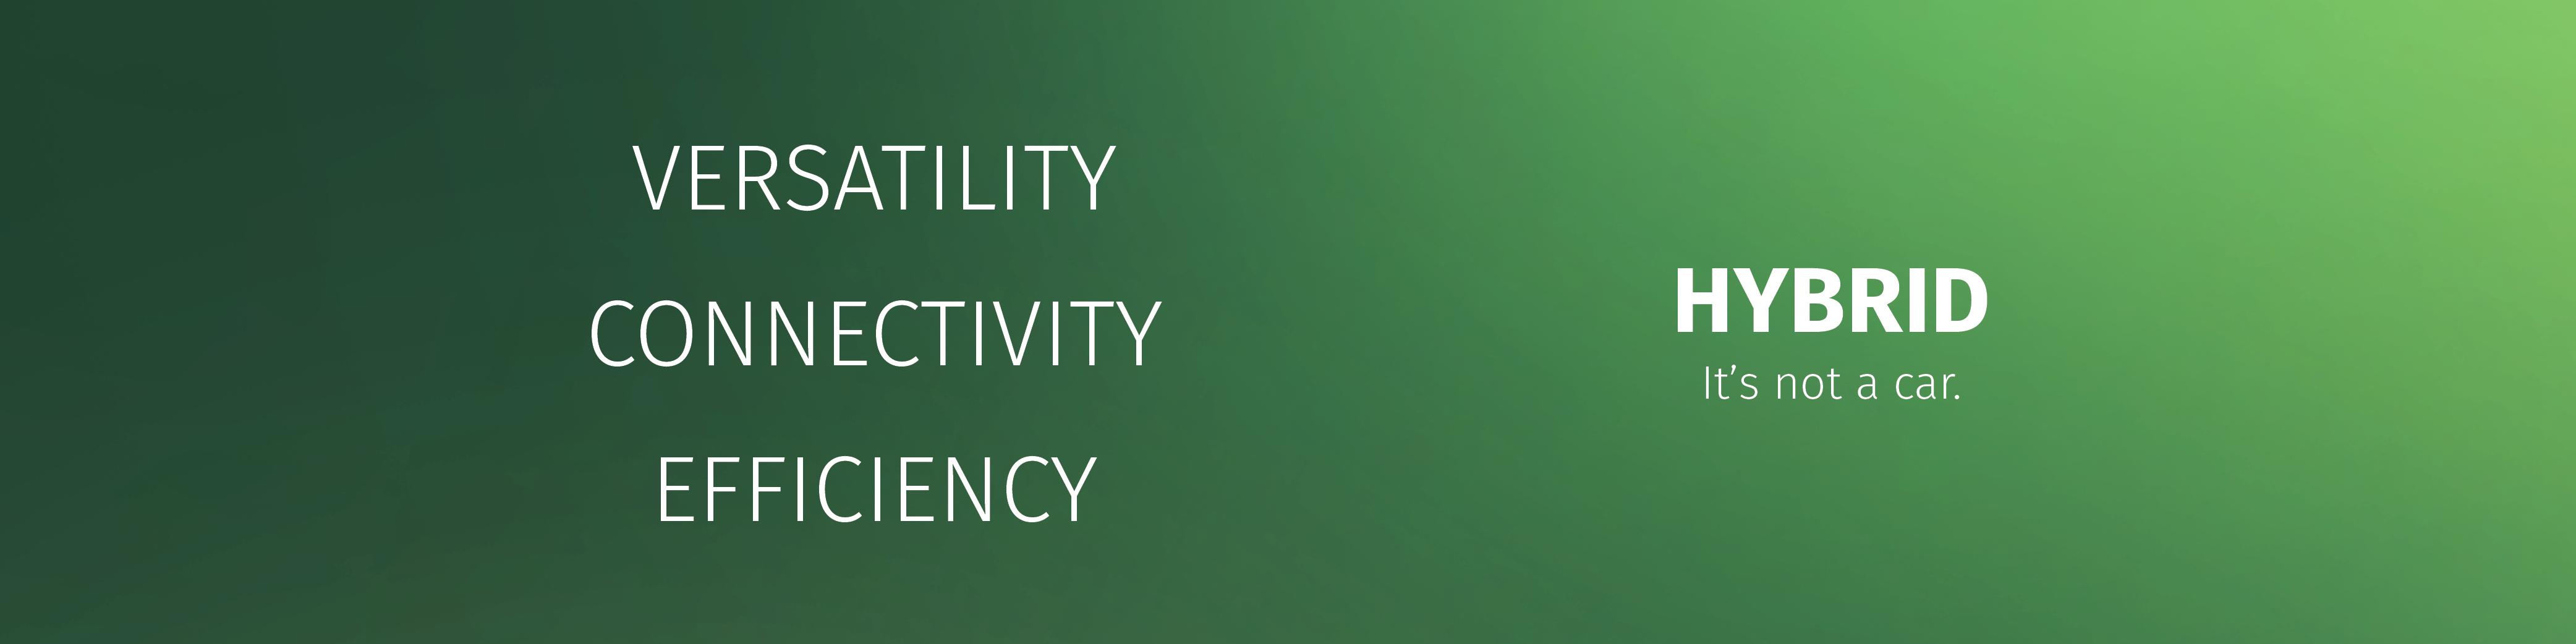 Versatility, Connectivity, Efficiency.